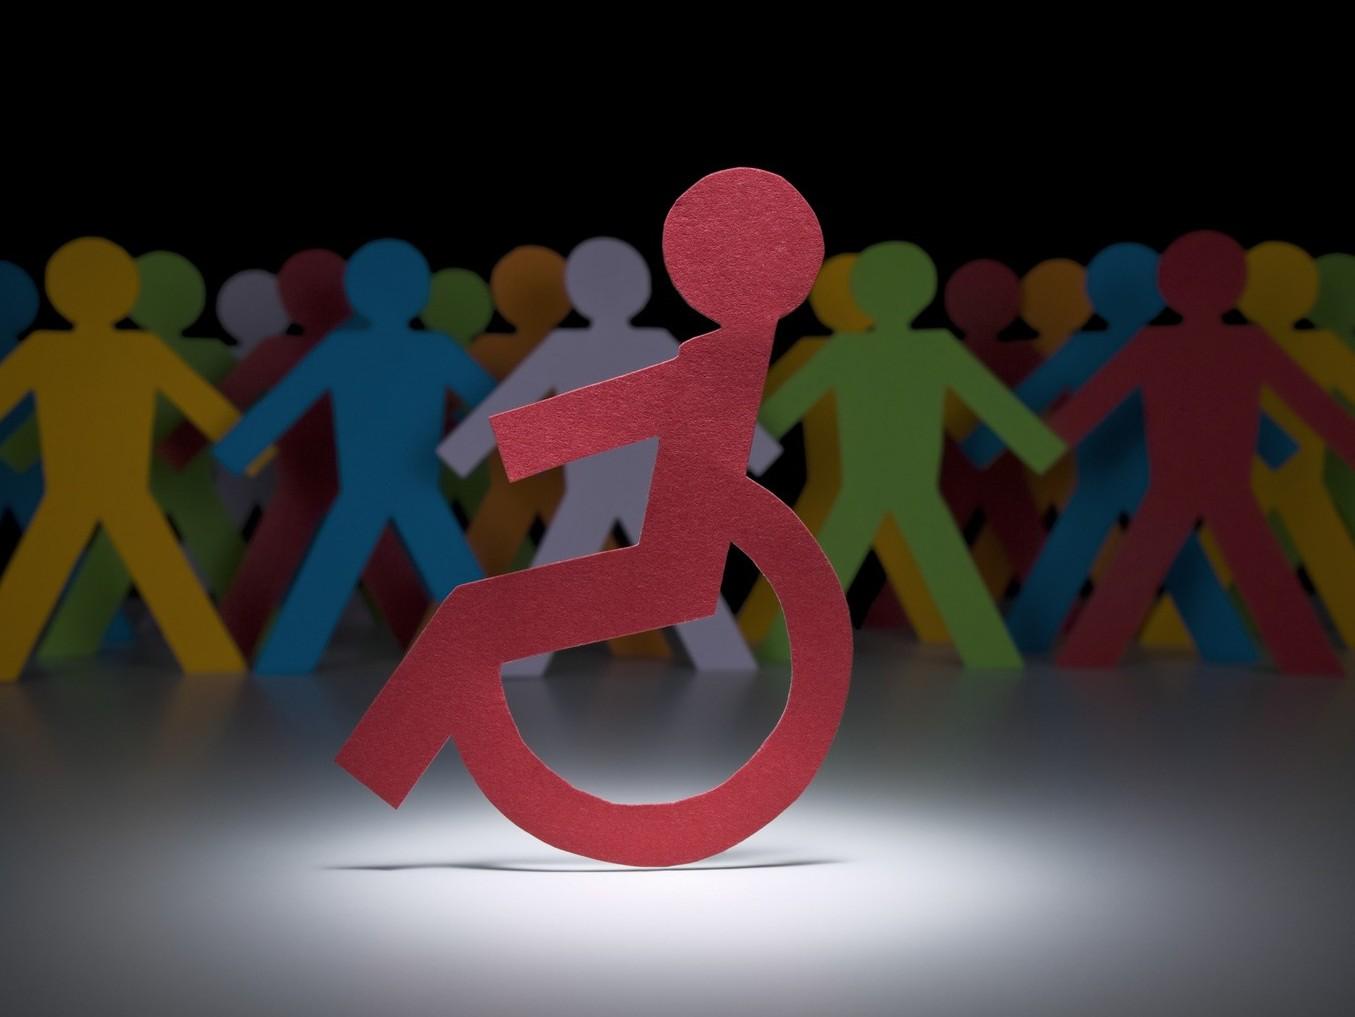 Legge 104/92 disabili e familiari. Per c